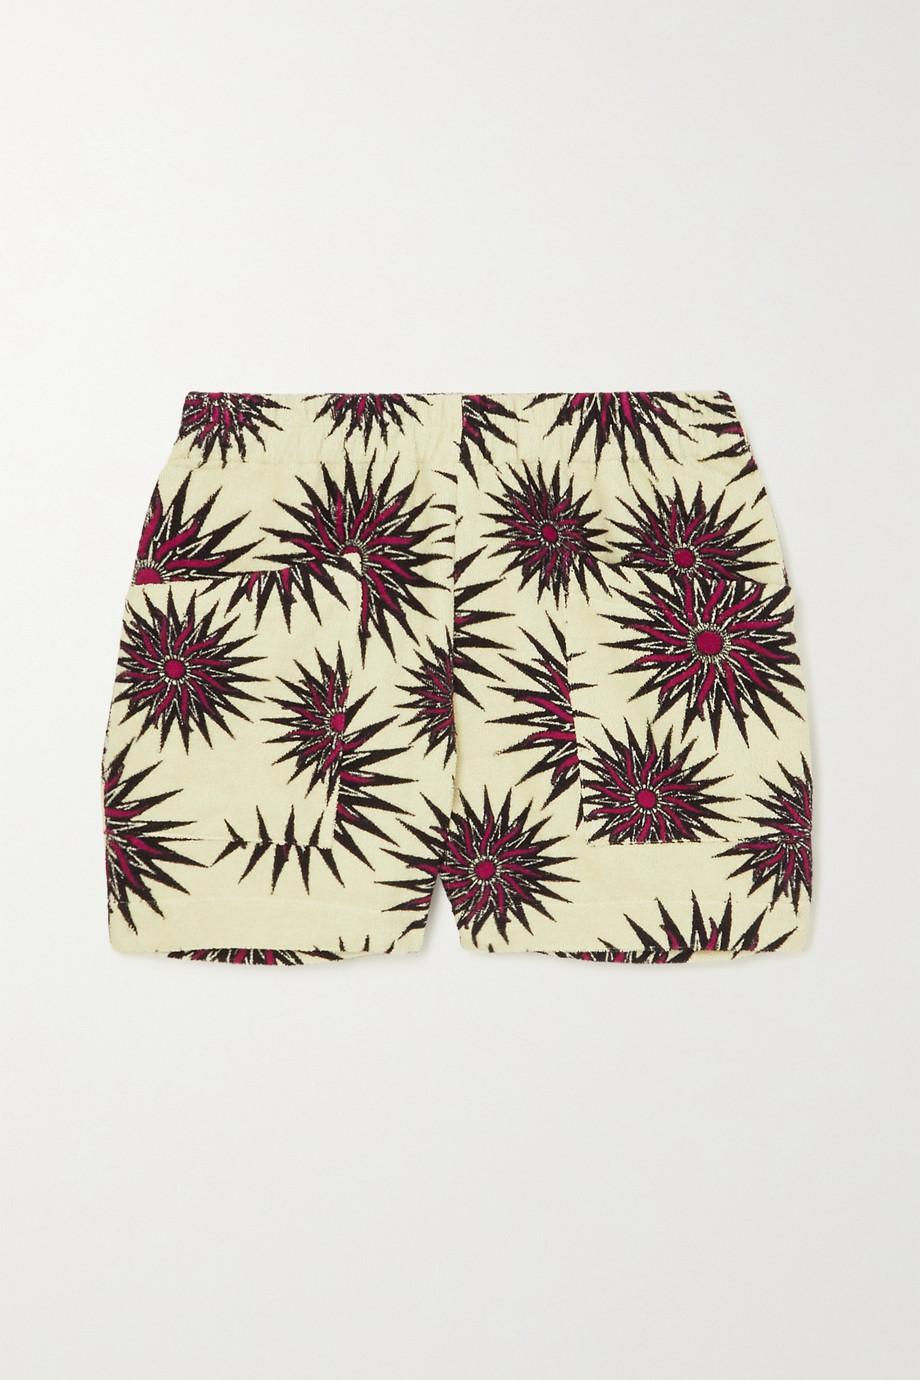 Dries Van Noten Pomar printed cotton-terry shorts